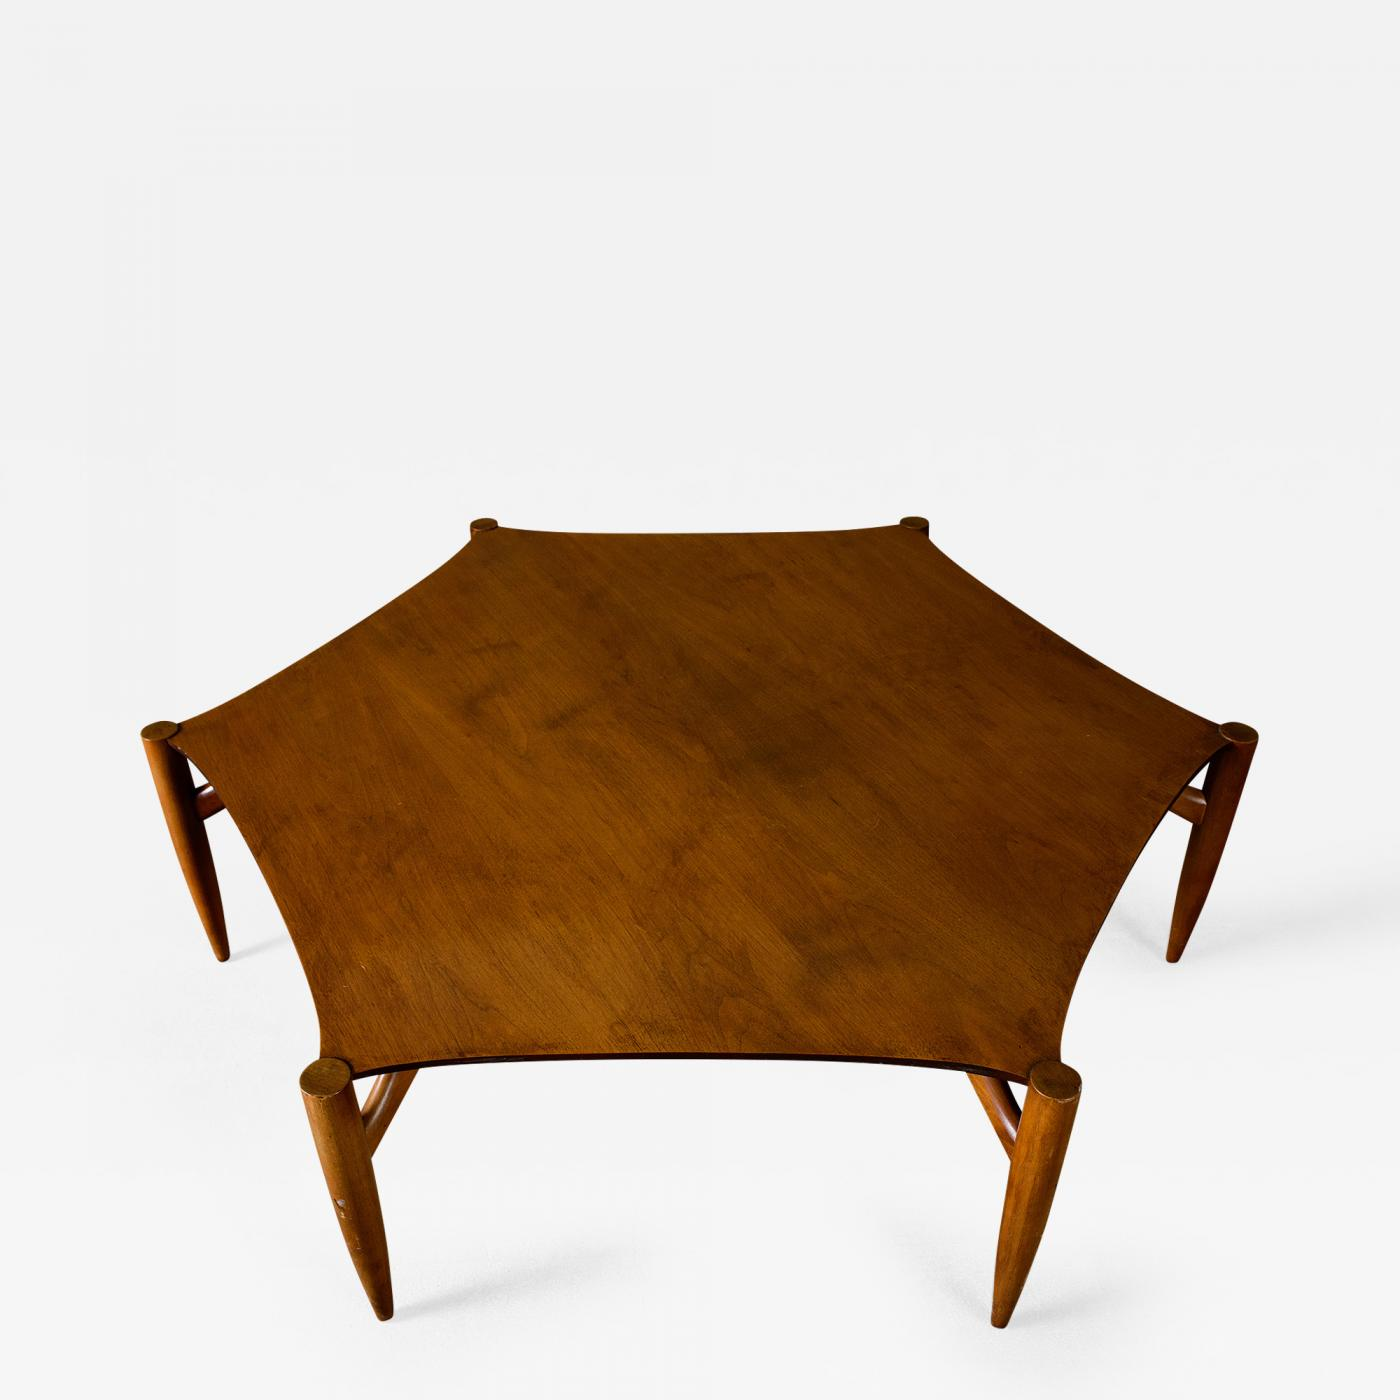 Greta grossman greta grossman hexagonal coffee table listings furniture tables coffee tables greta grossman geotapseo Gallery